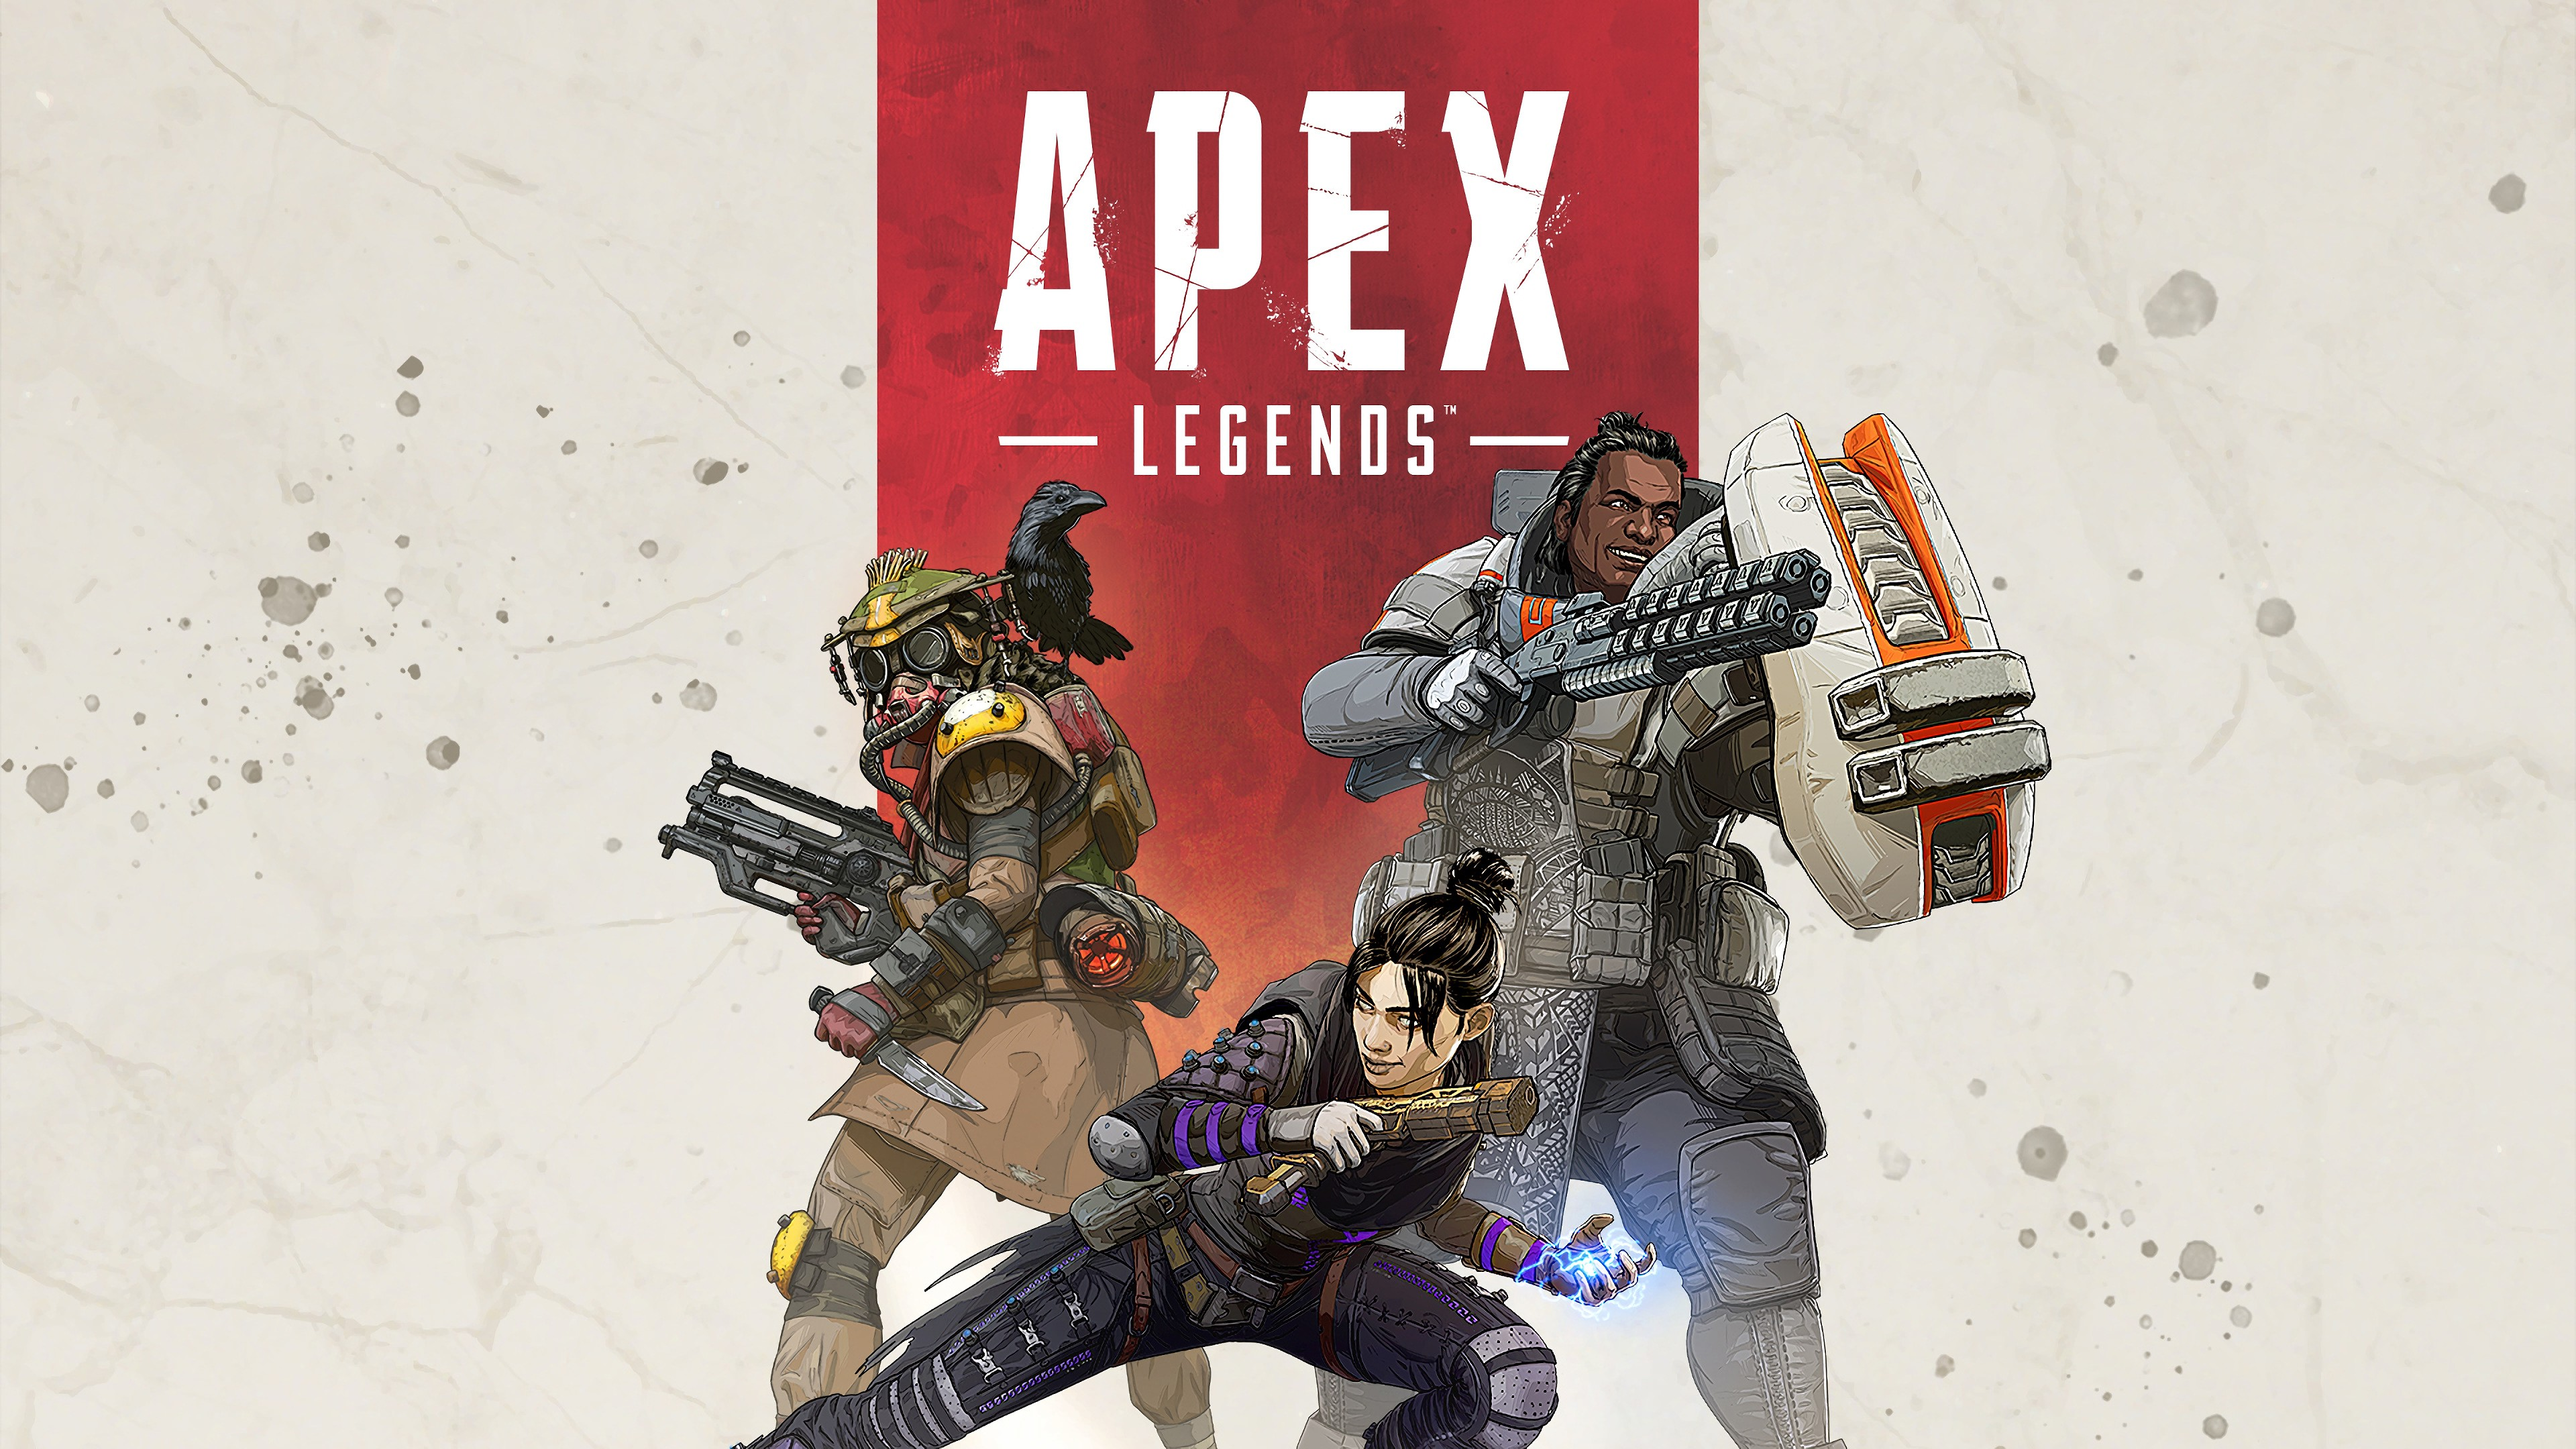 Wallpaper 4k Apex Legends Poster 4k 2019 Apex Legends 4k Wallpaper